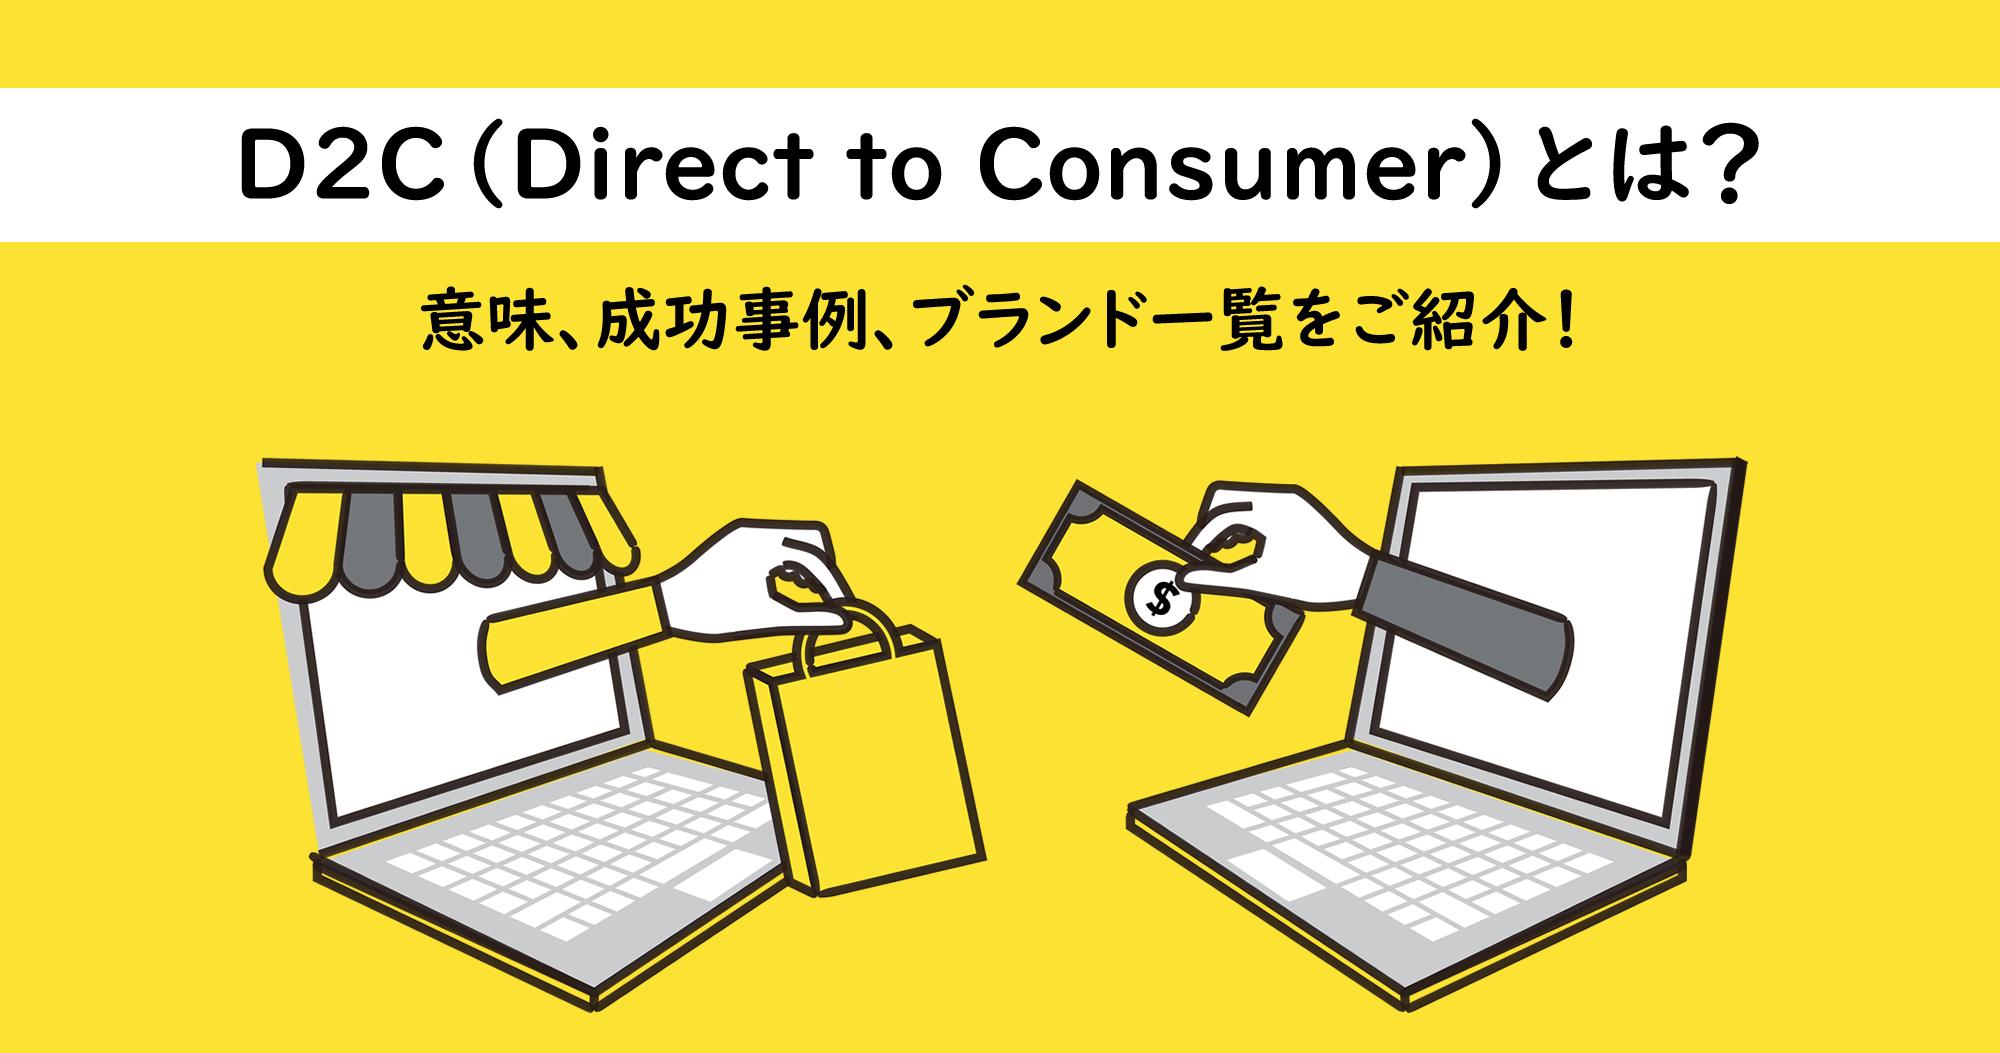 D2C(Direct to Consumer)とは?意味、成功事例、ブランド一覧をご紹介!